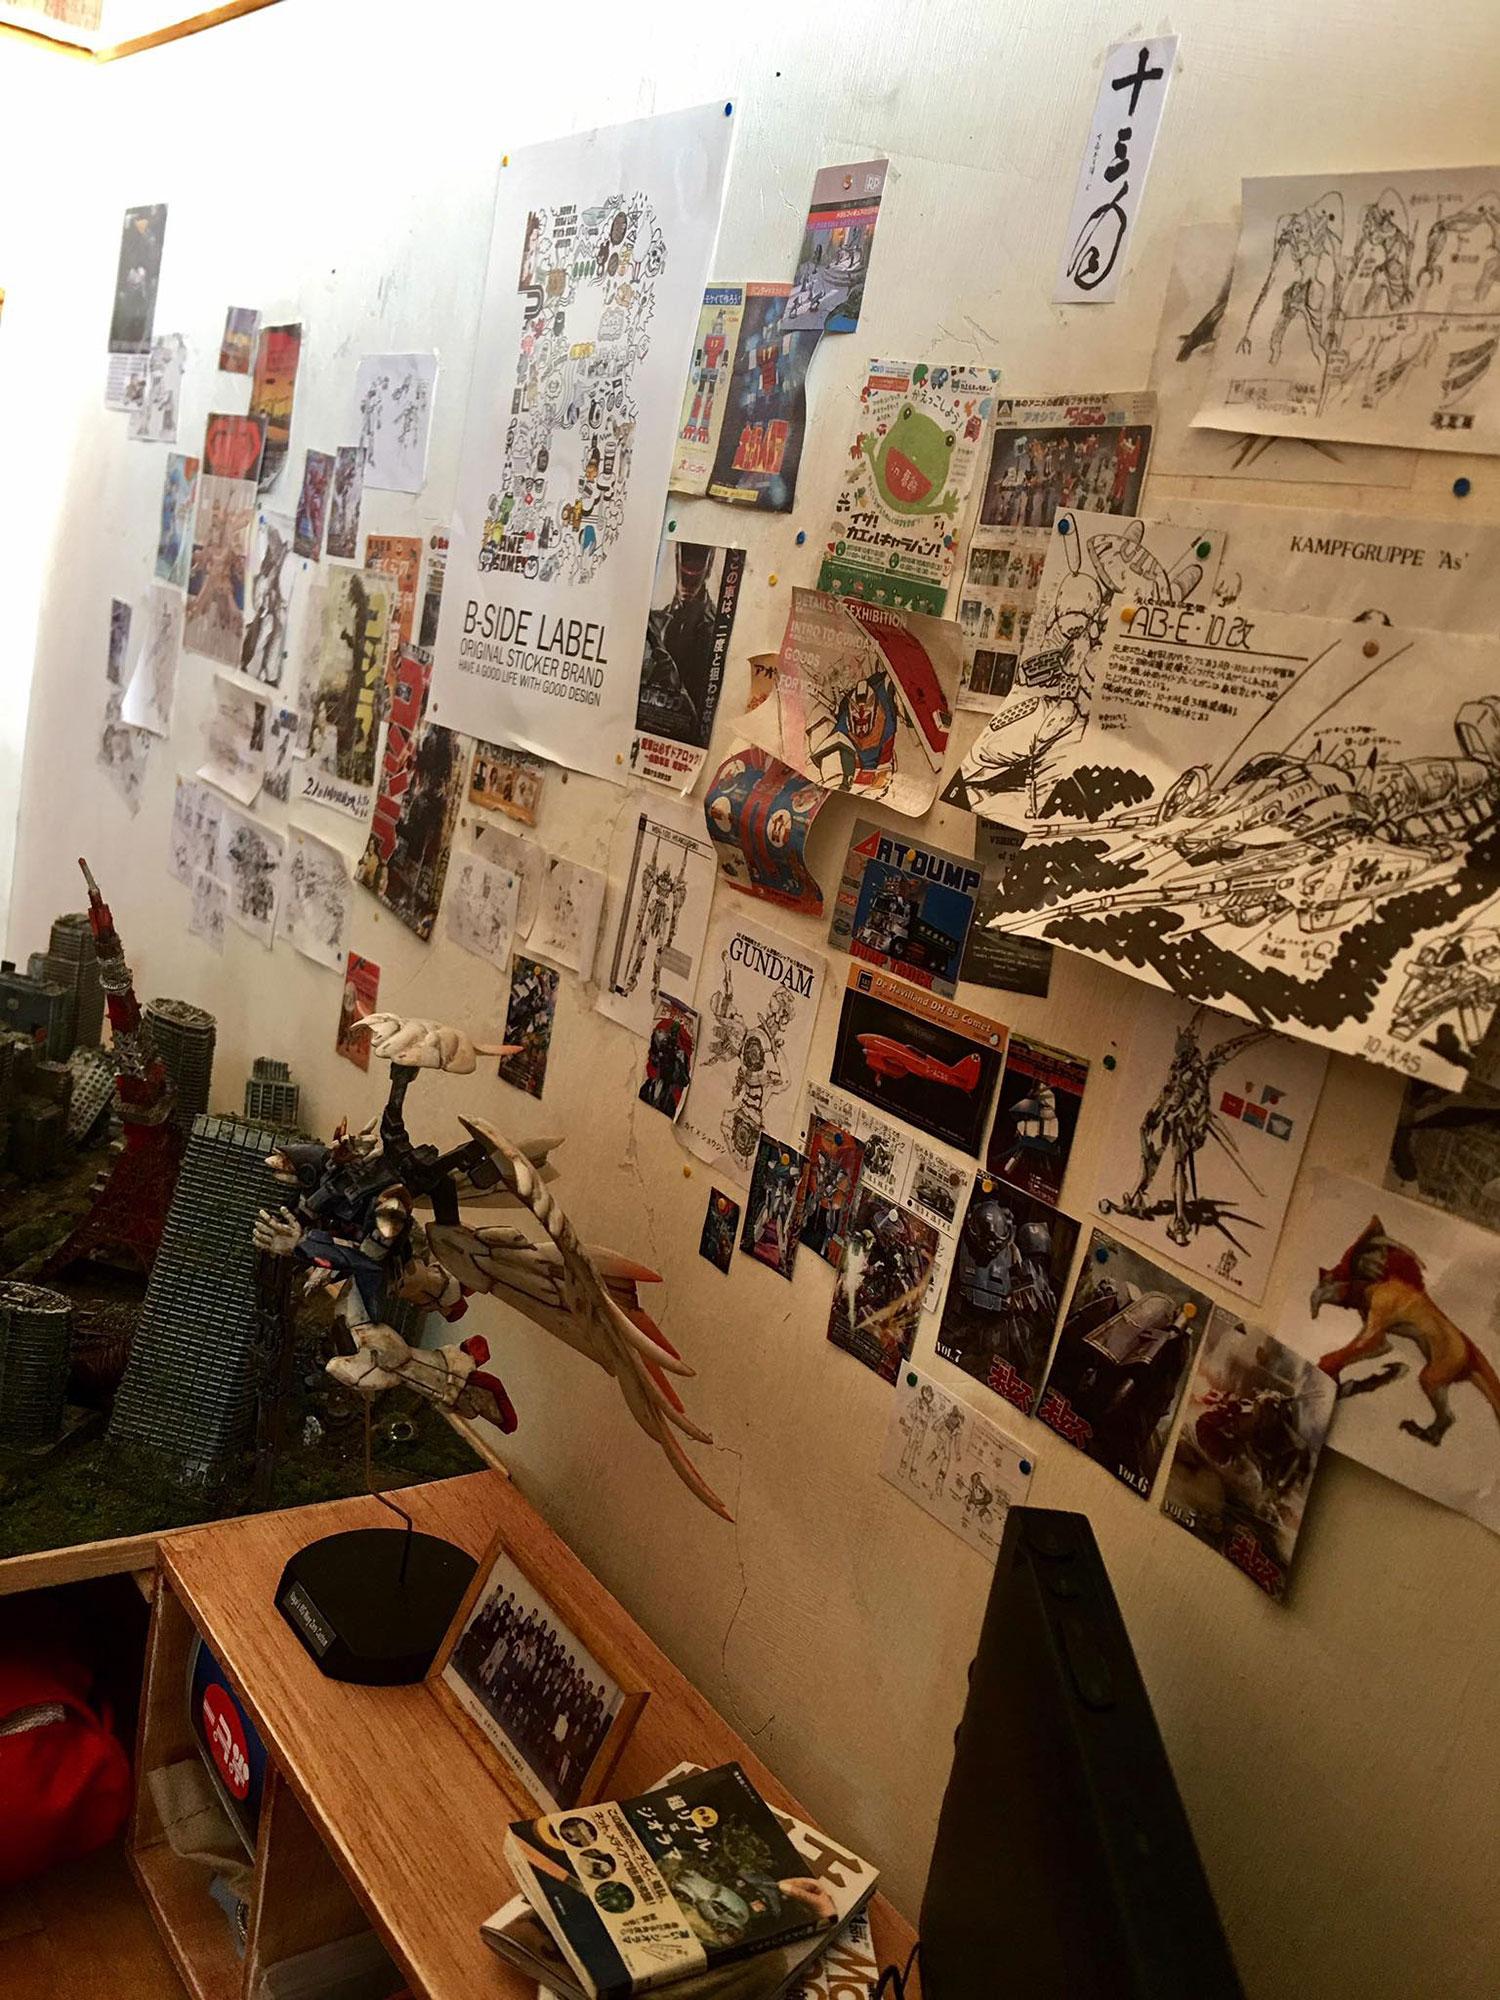 ARTIST MAKES MINIATURE MODEL OF HIS ROOM 16